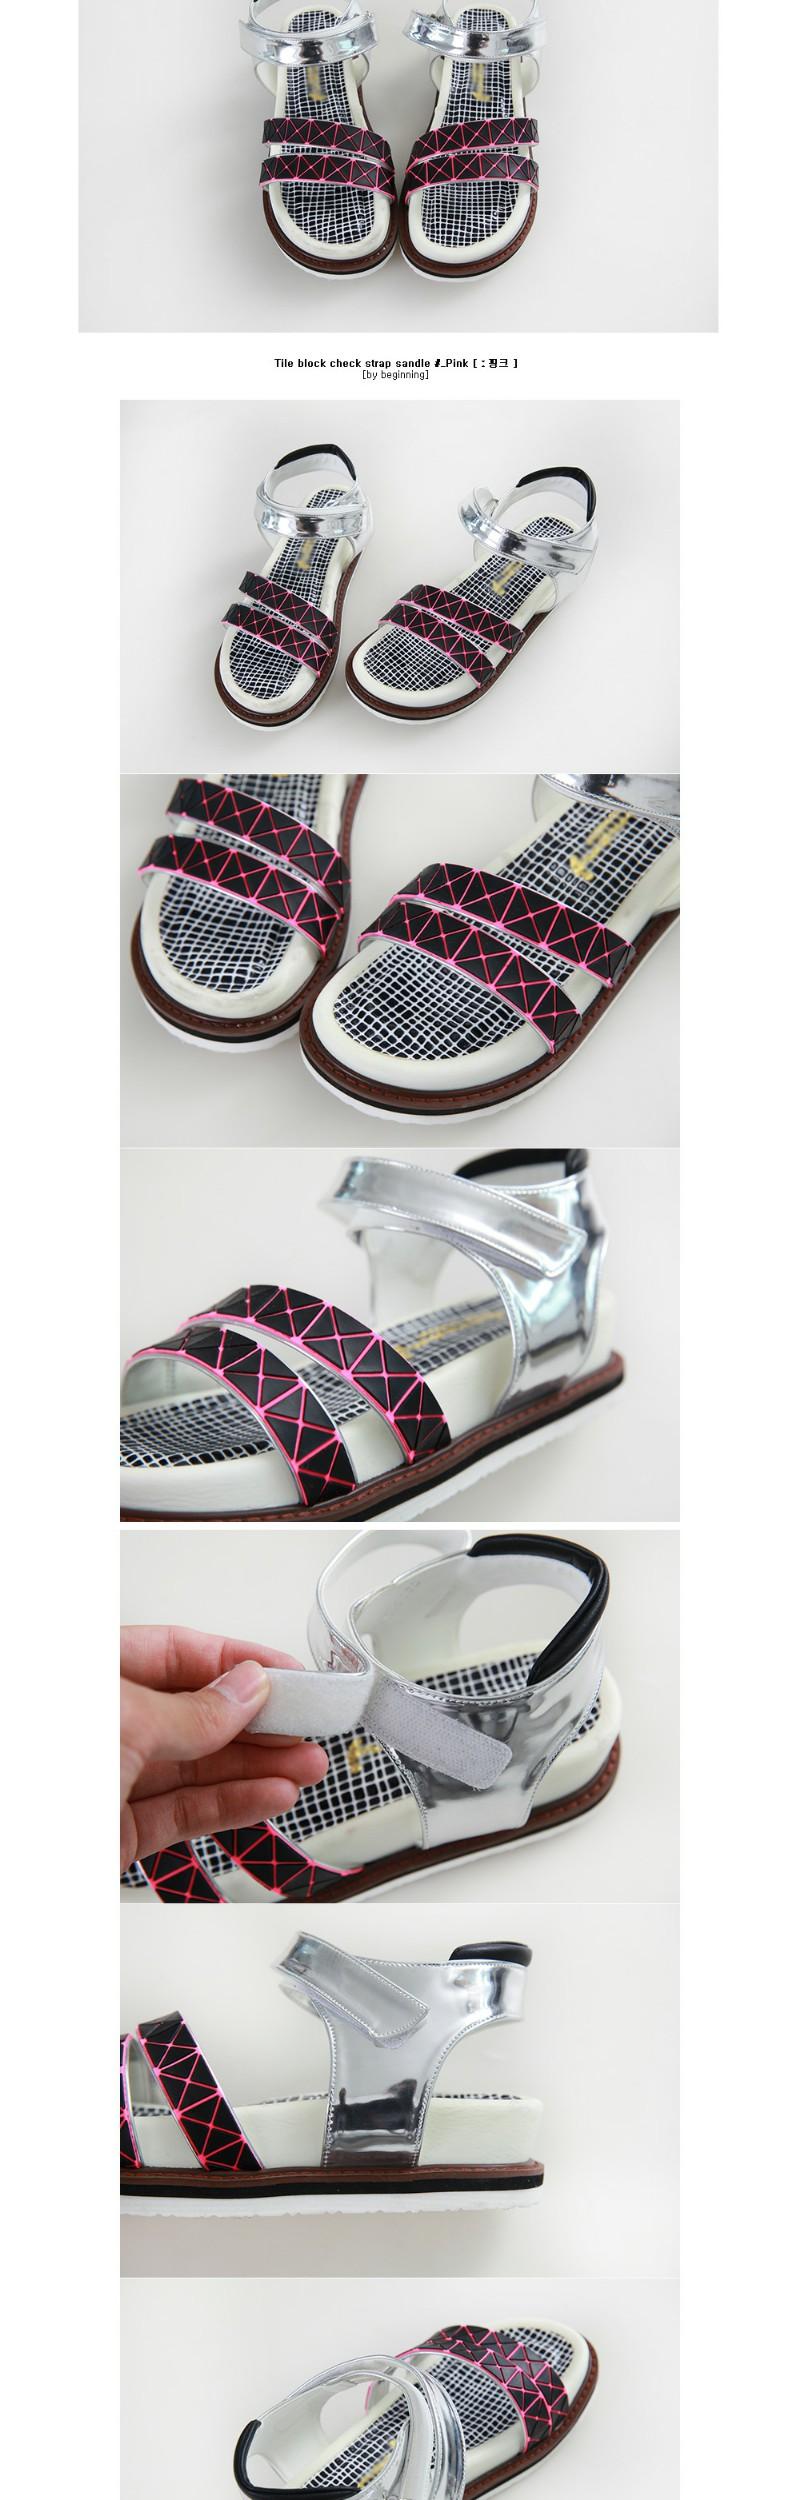 Tile block check strap sandle